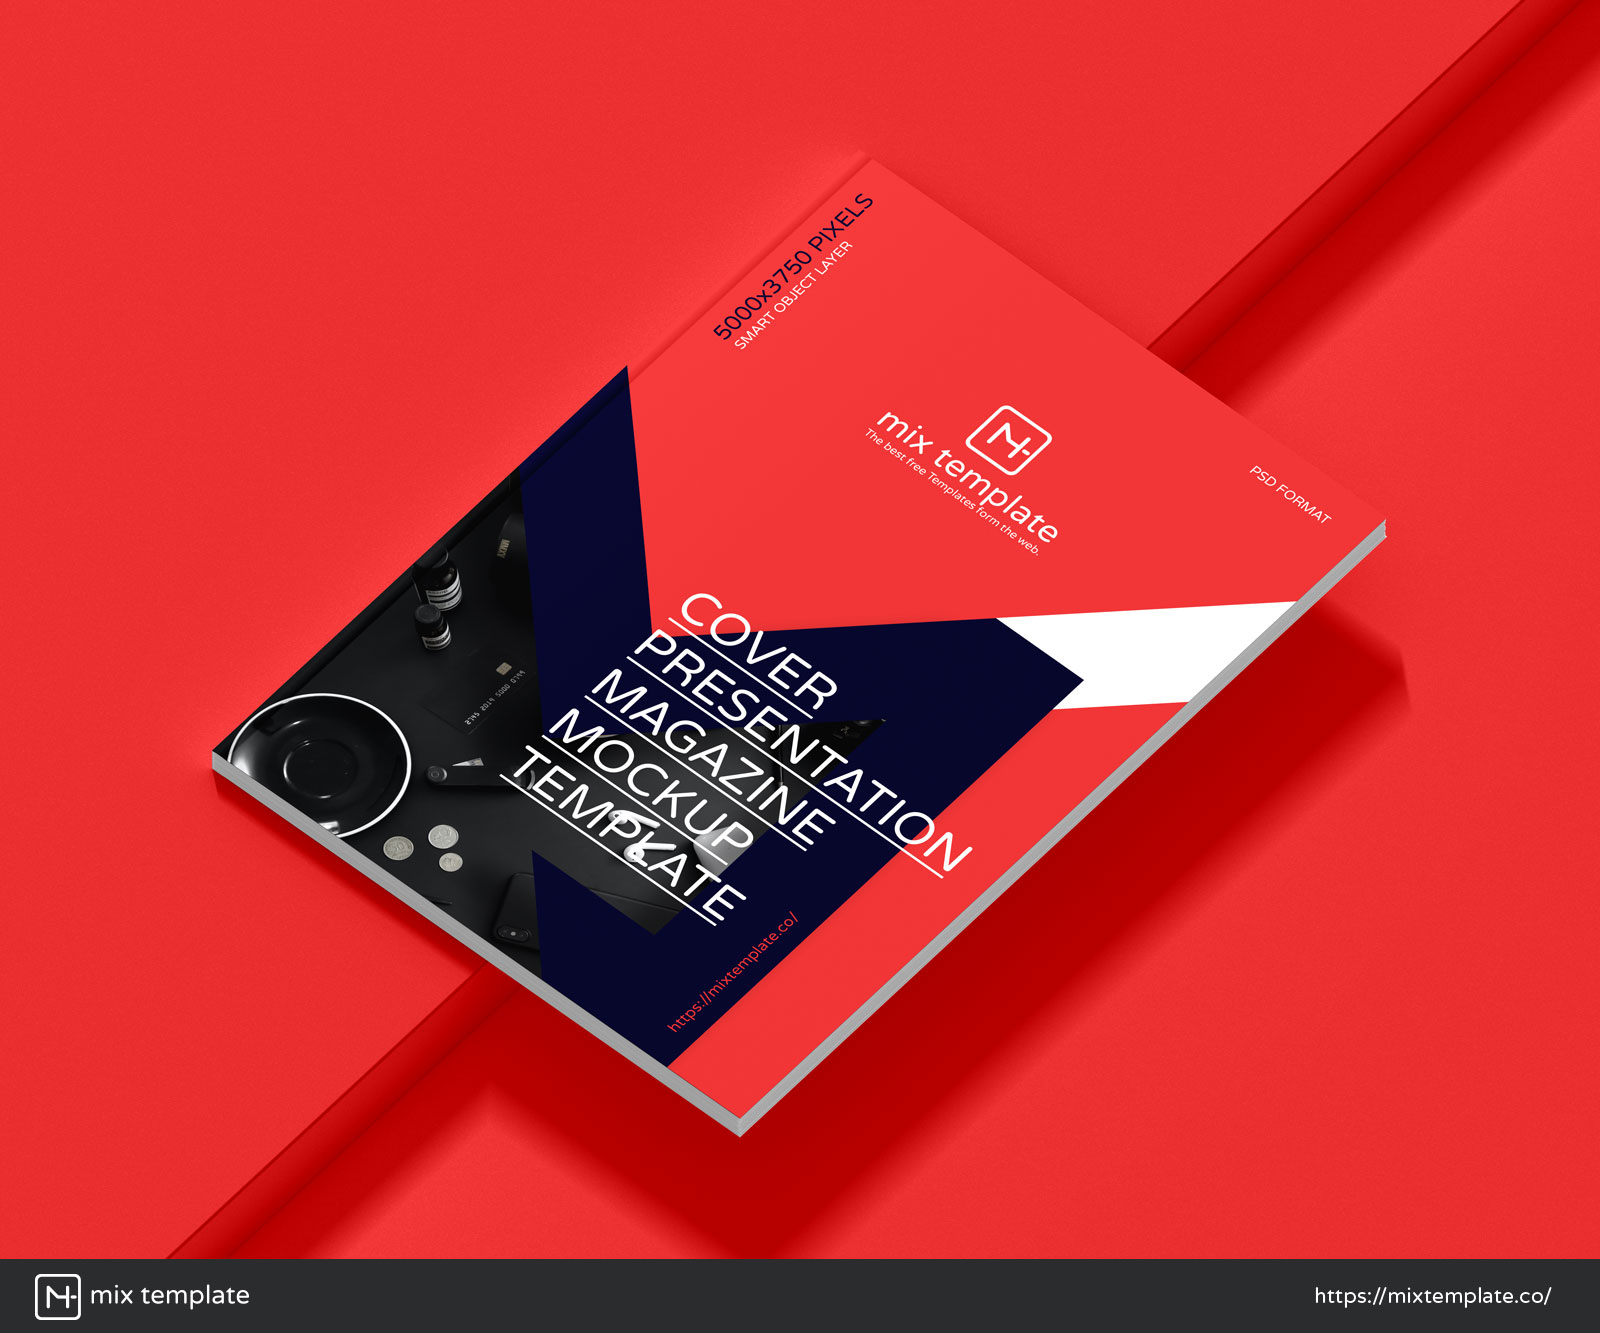 Free-Cover-Presentation-Magazine-Mockup-Template